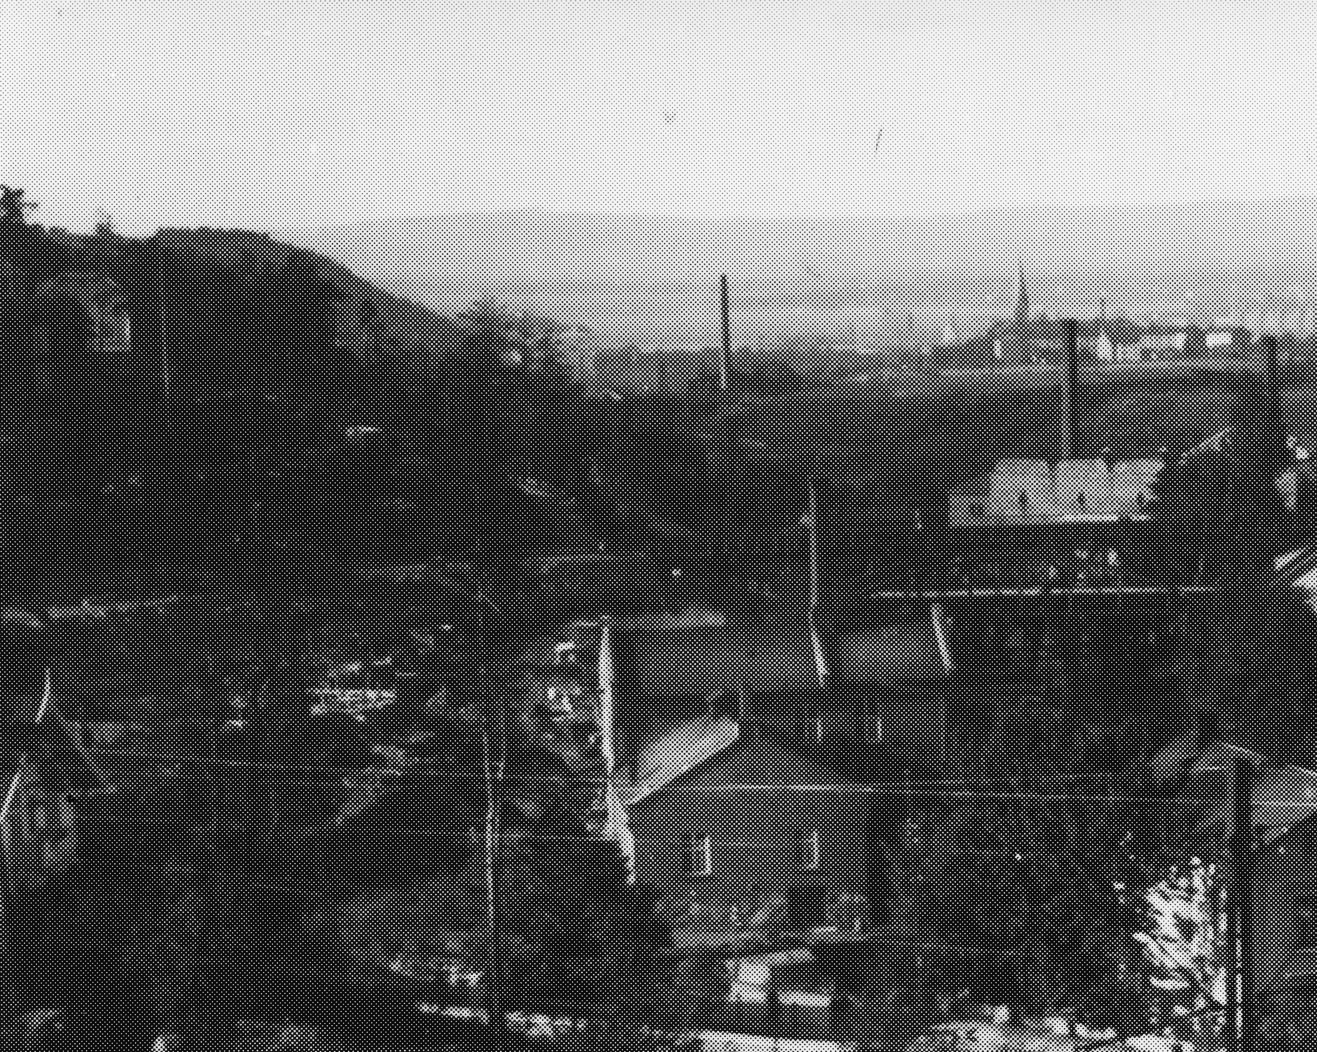 Foto: Østensjø lokalhistoriske bilder